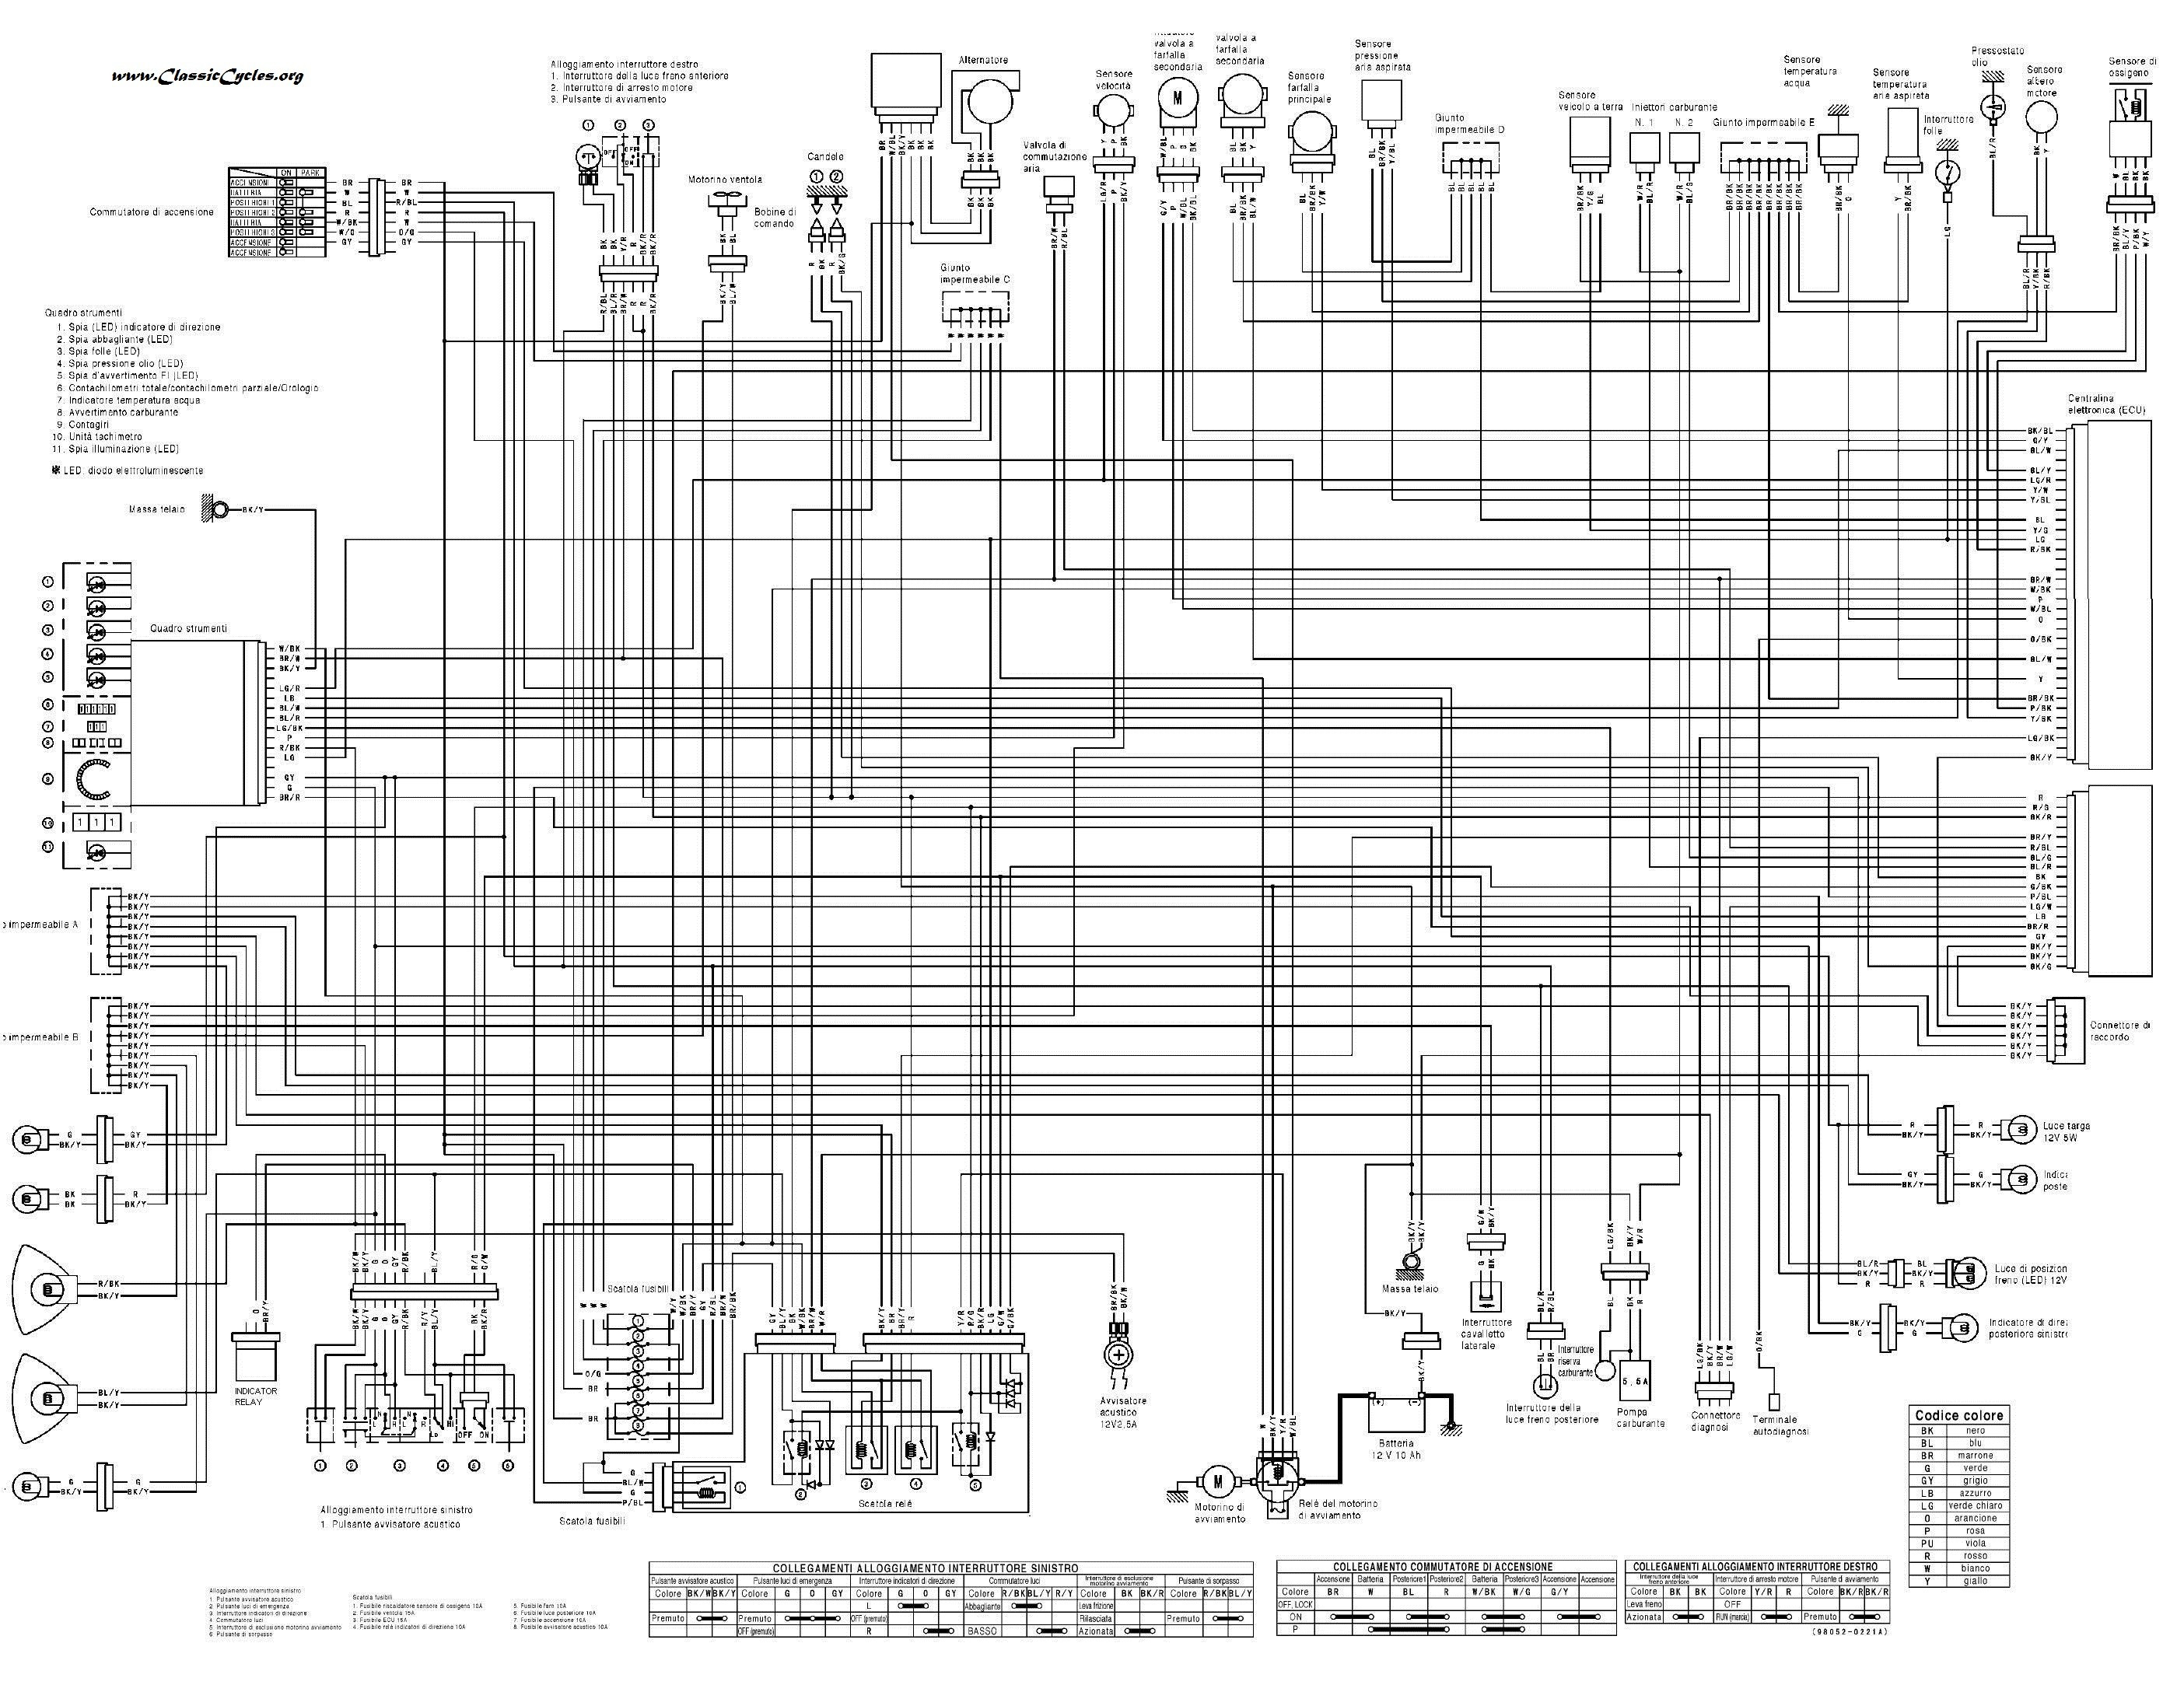 2003 Dodge Ram 1500 Engine Diagram 2003 Dodge Durango Emissions Diagram Free Download Wiring Diagram Of 2003 Dodge Ram 1500 Engine Diagram